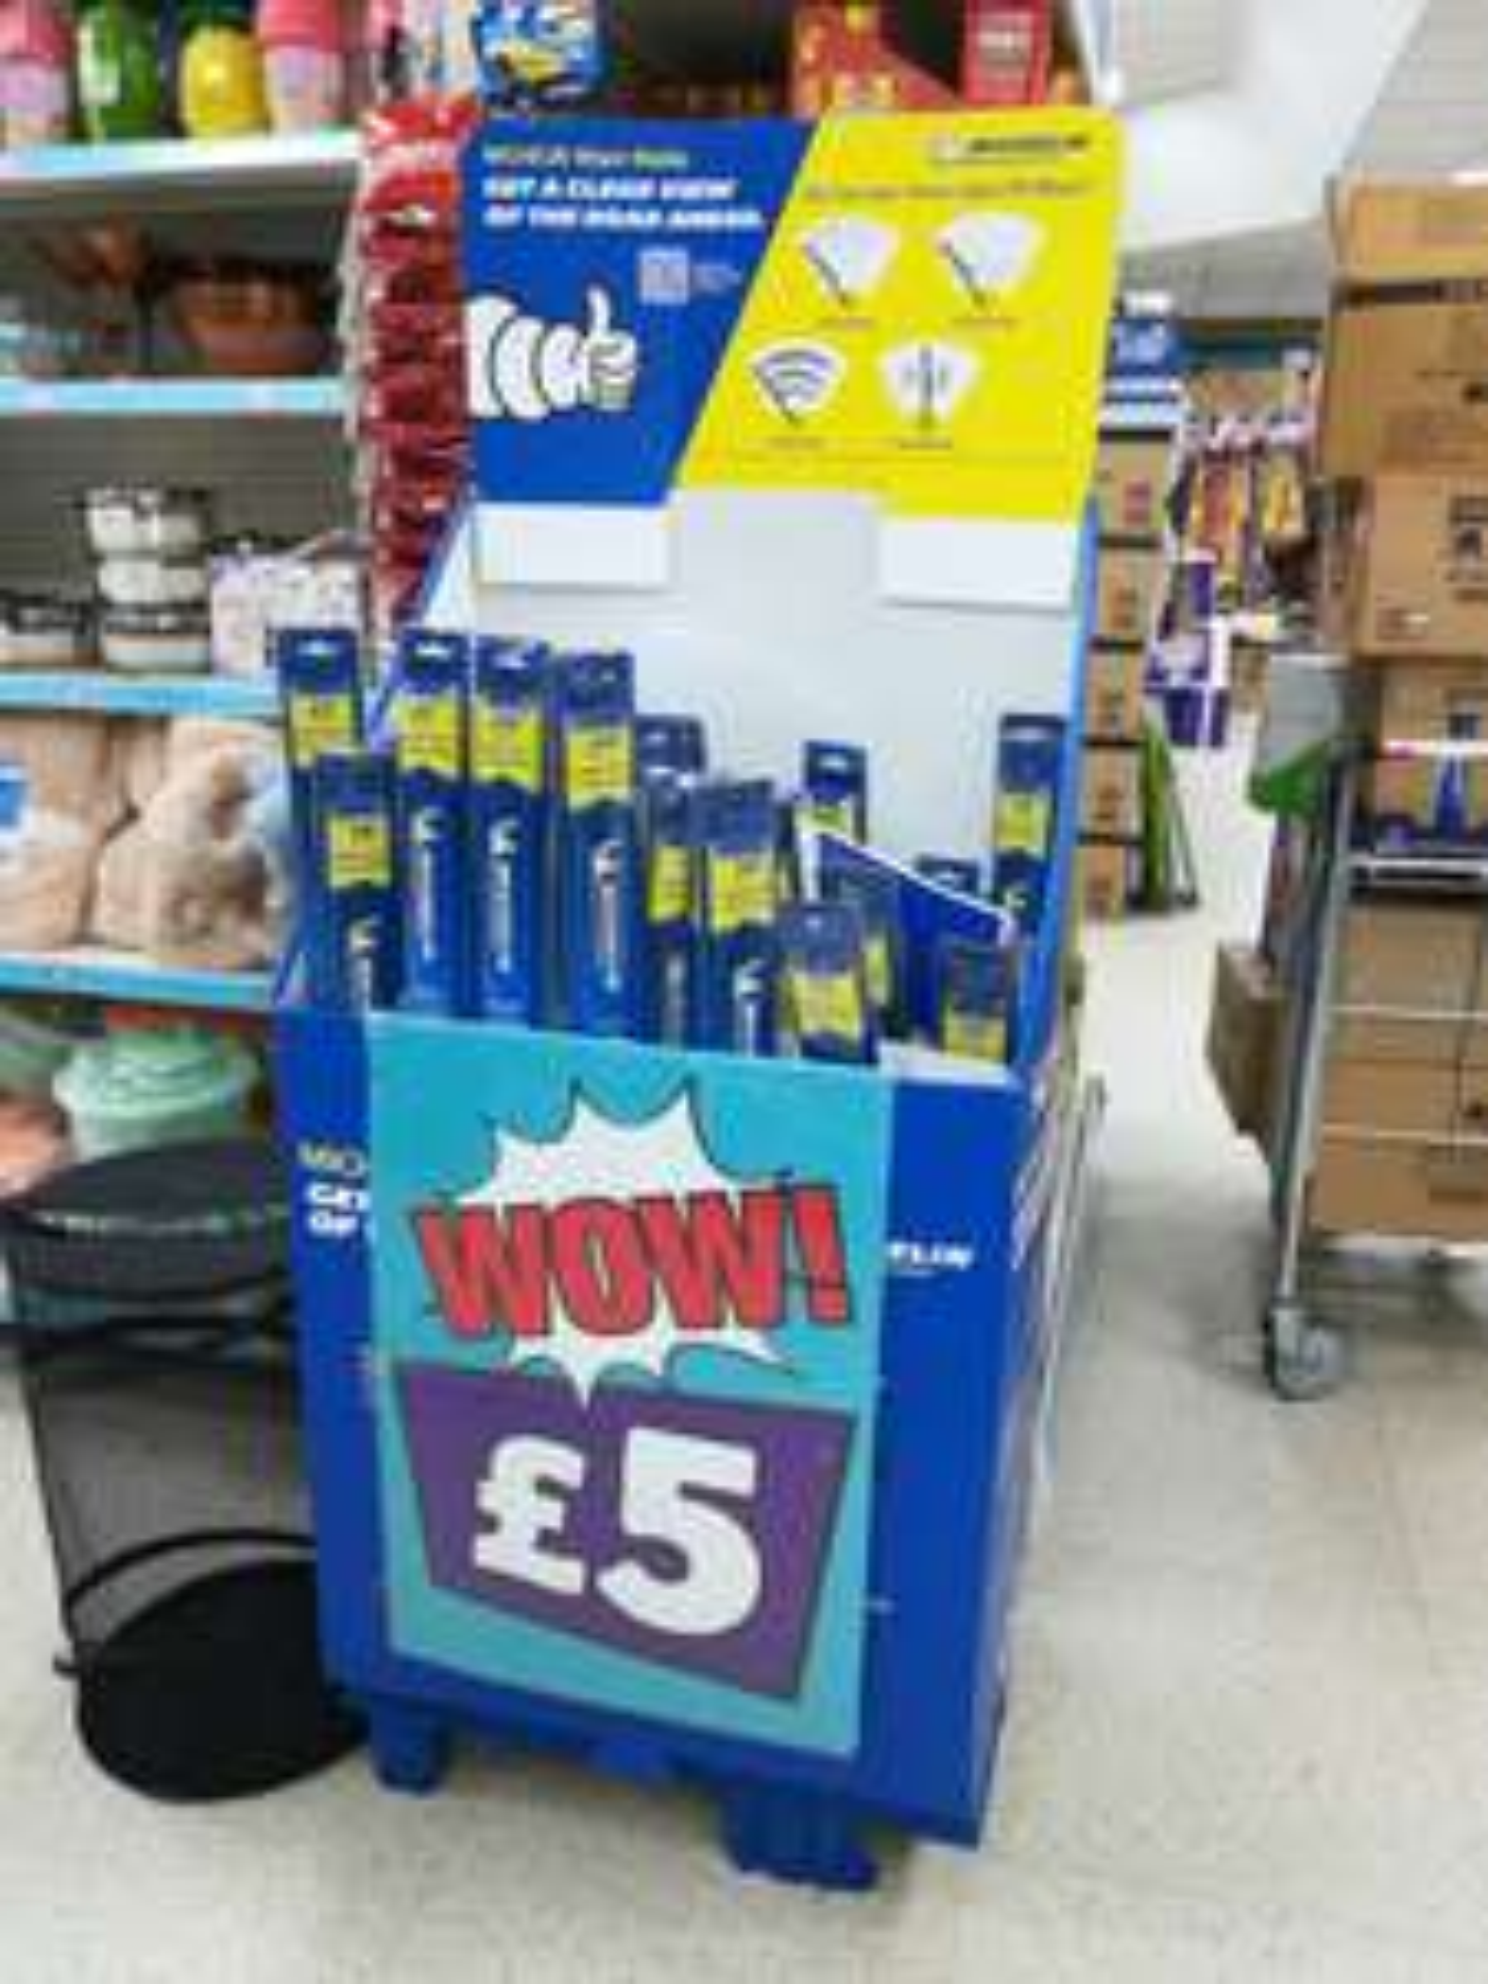 Michelin wiper blades £5 @ Poundland